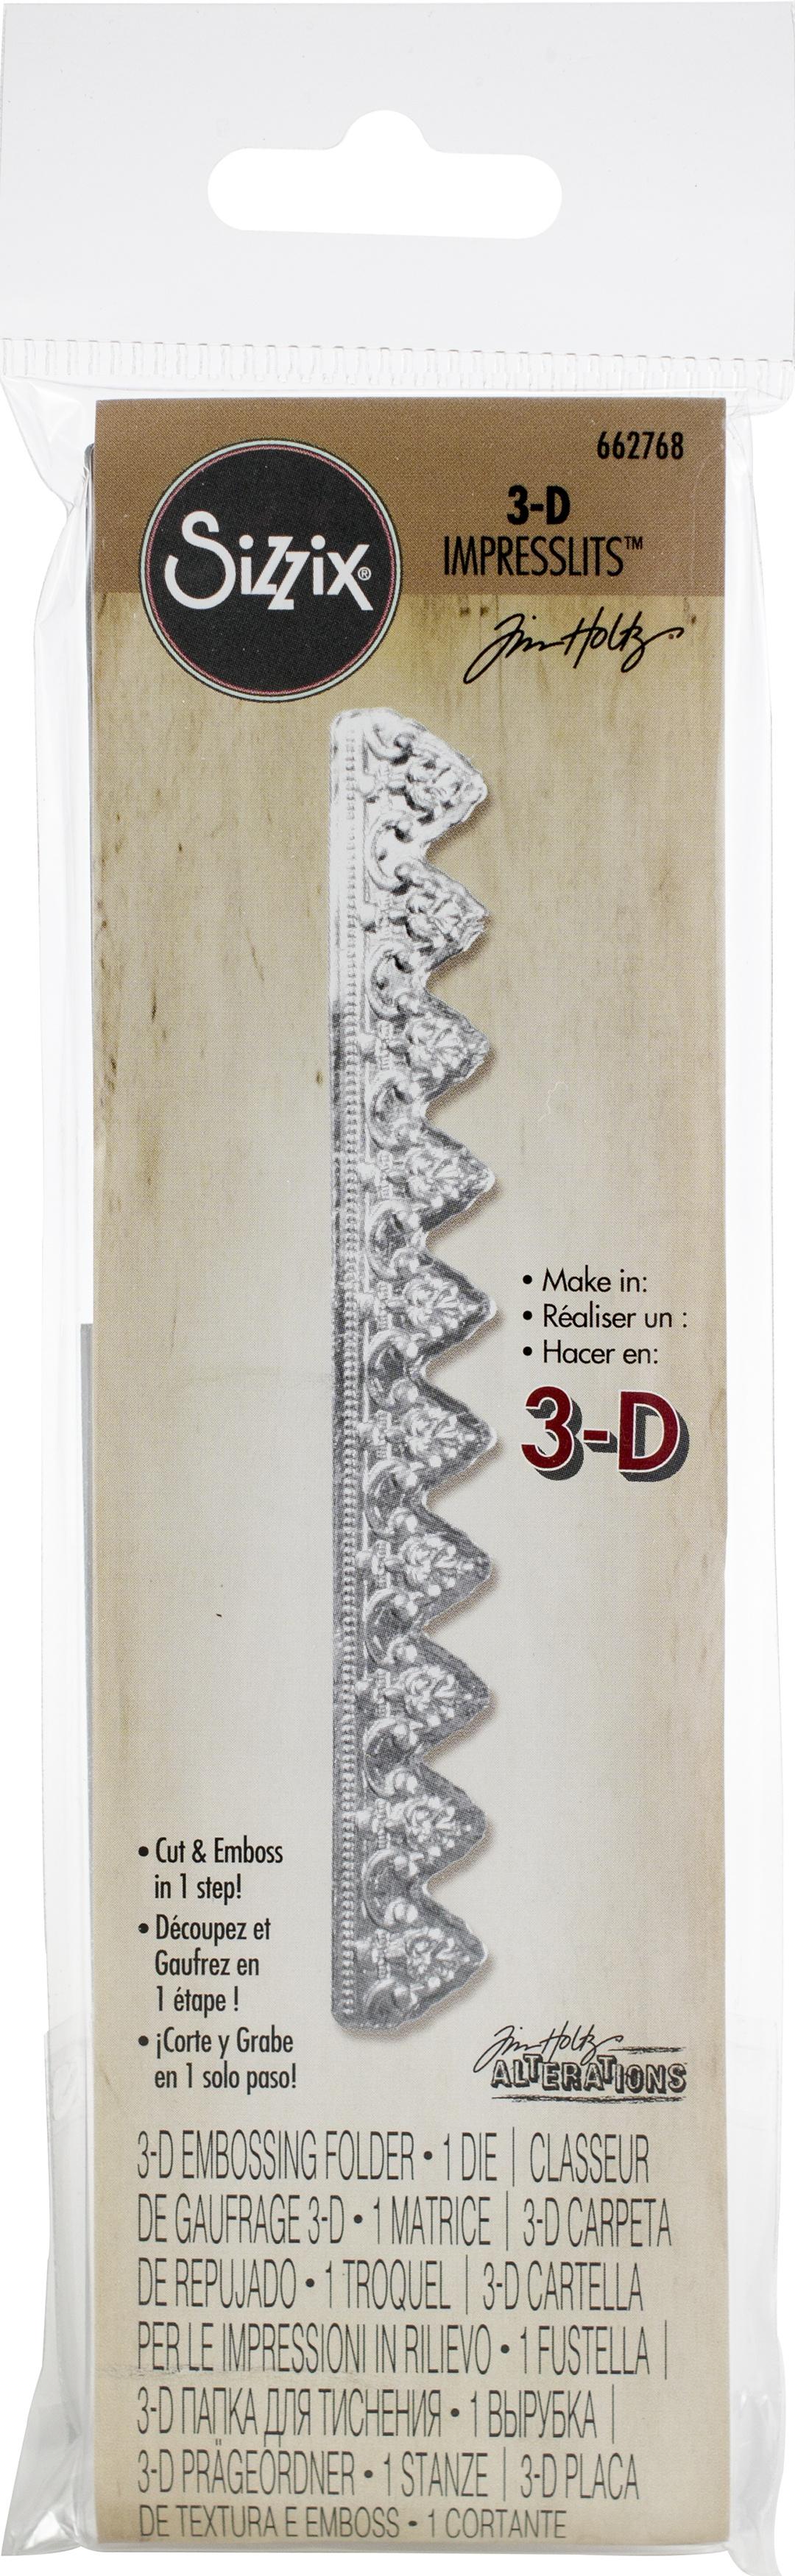 Sizzix 3D Impresslits Embossing Folder By Tim Holtz-Mini Provincial